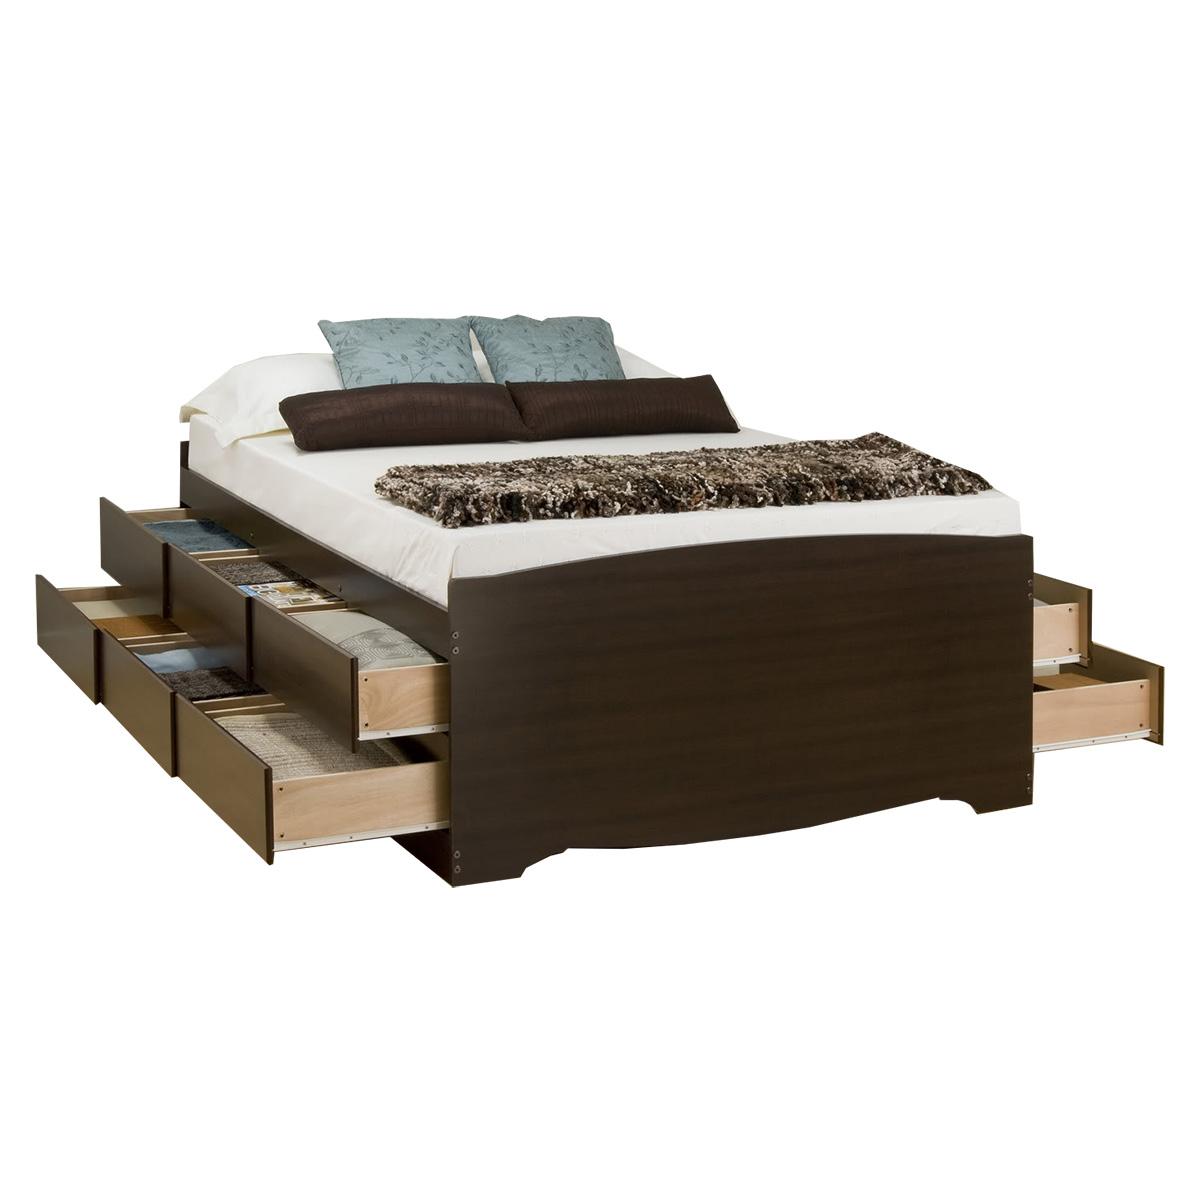 Captains Storage Platform Bed   Espresso Captains Storage Platform Bed    Espresso